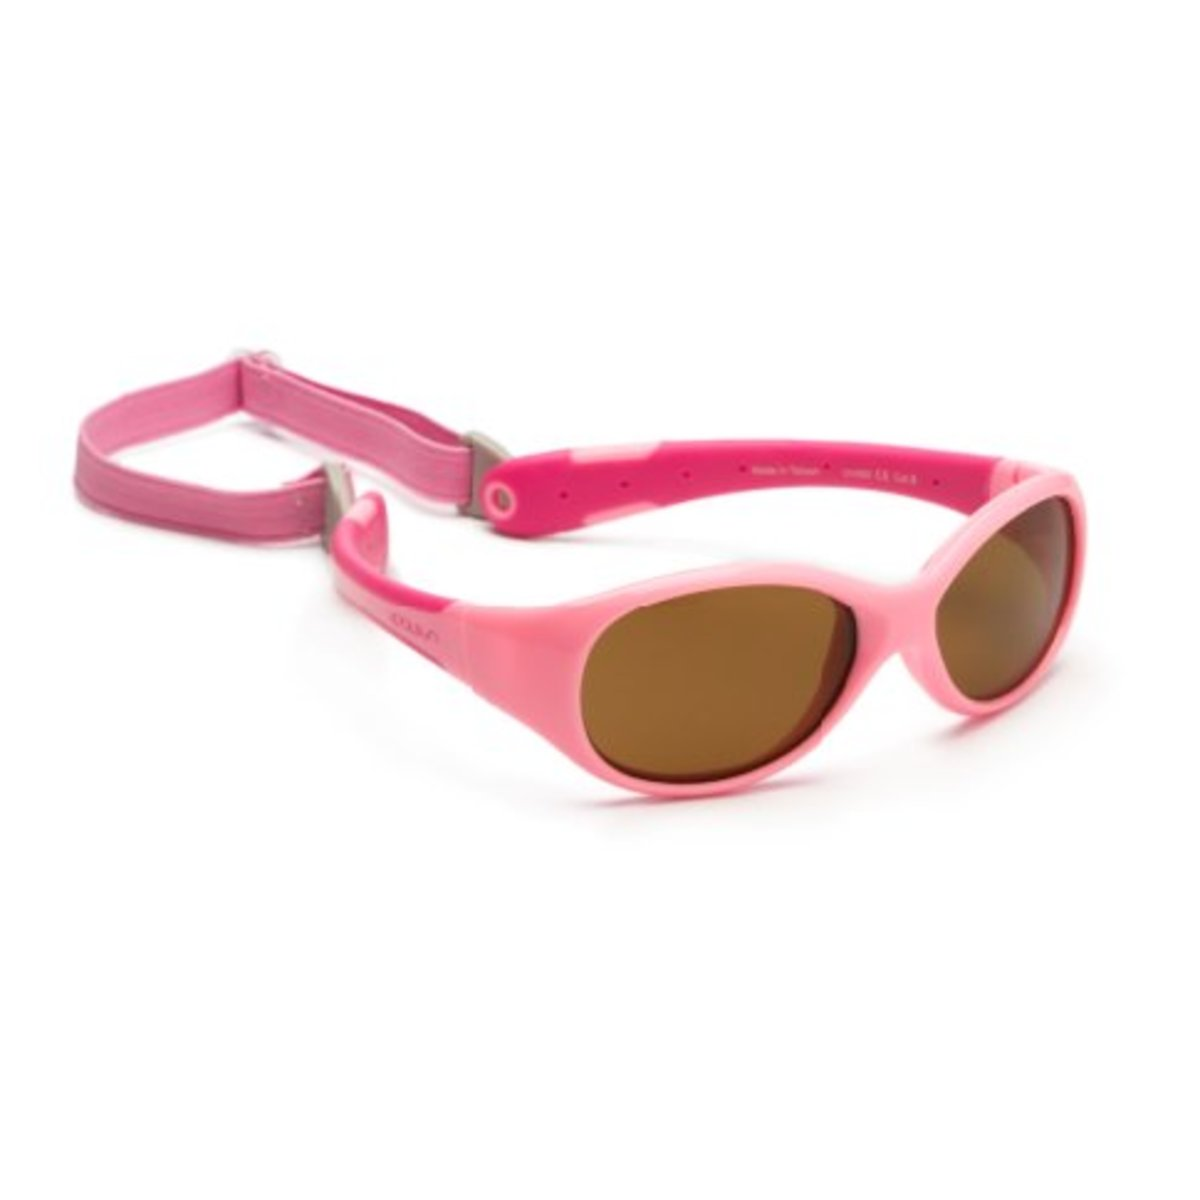 Koolsun Flex Aqua Grey Baby Sunglasses 0-3 Years 0+